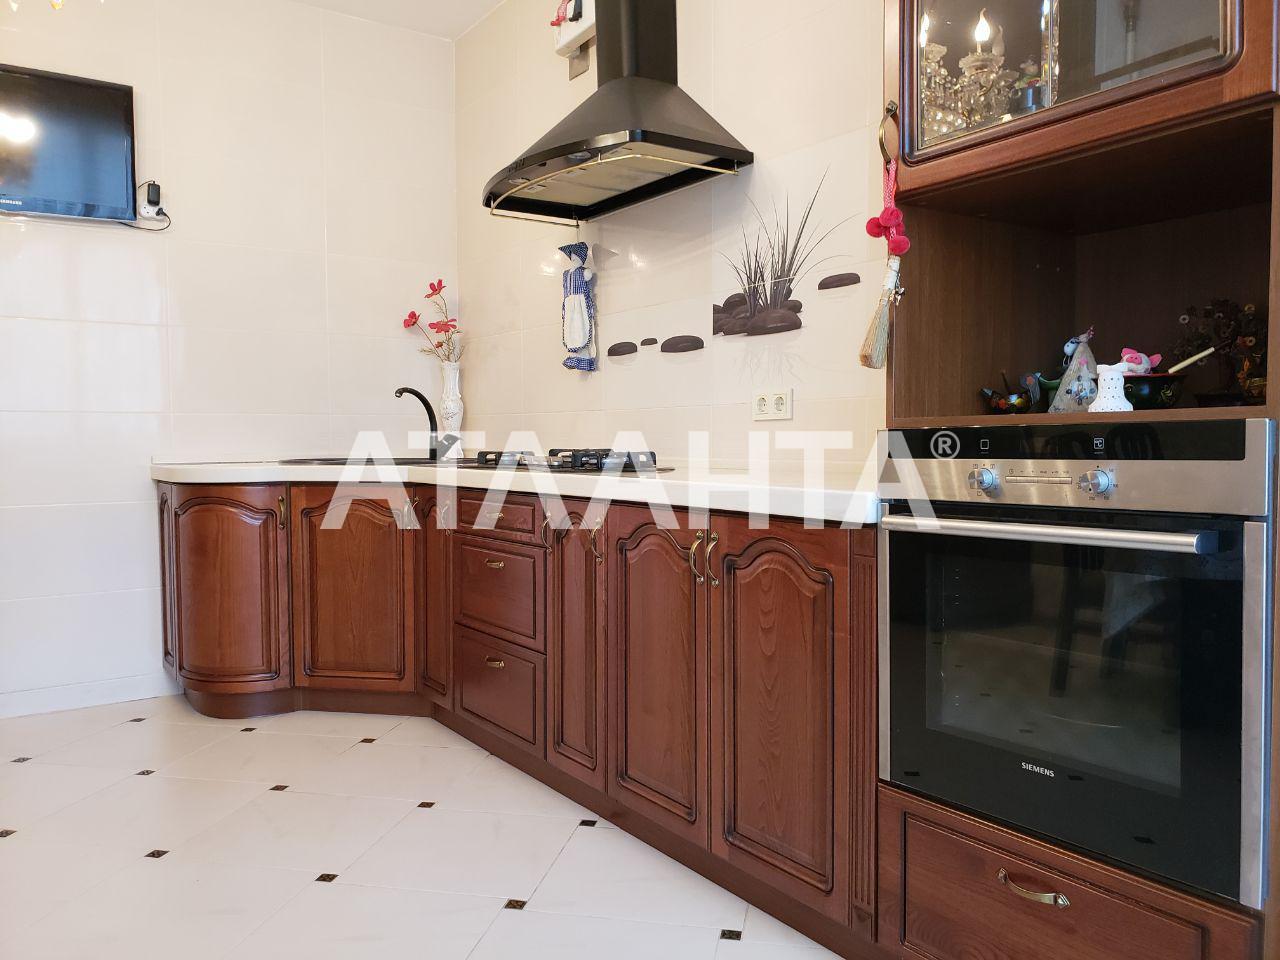 Продается 2-комнатная Квартира на ул. Зоопарковая — 104 900 у.е.